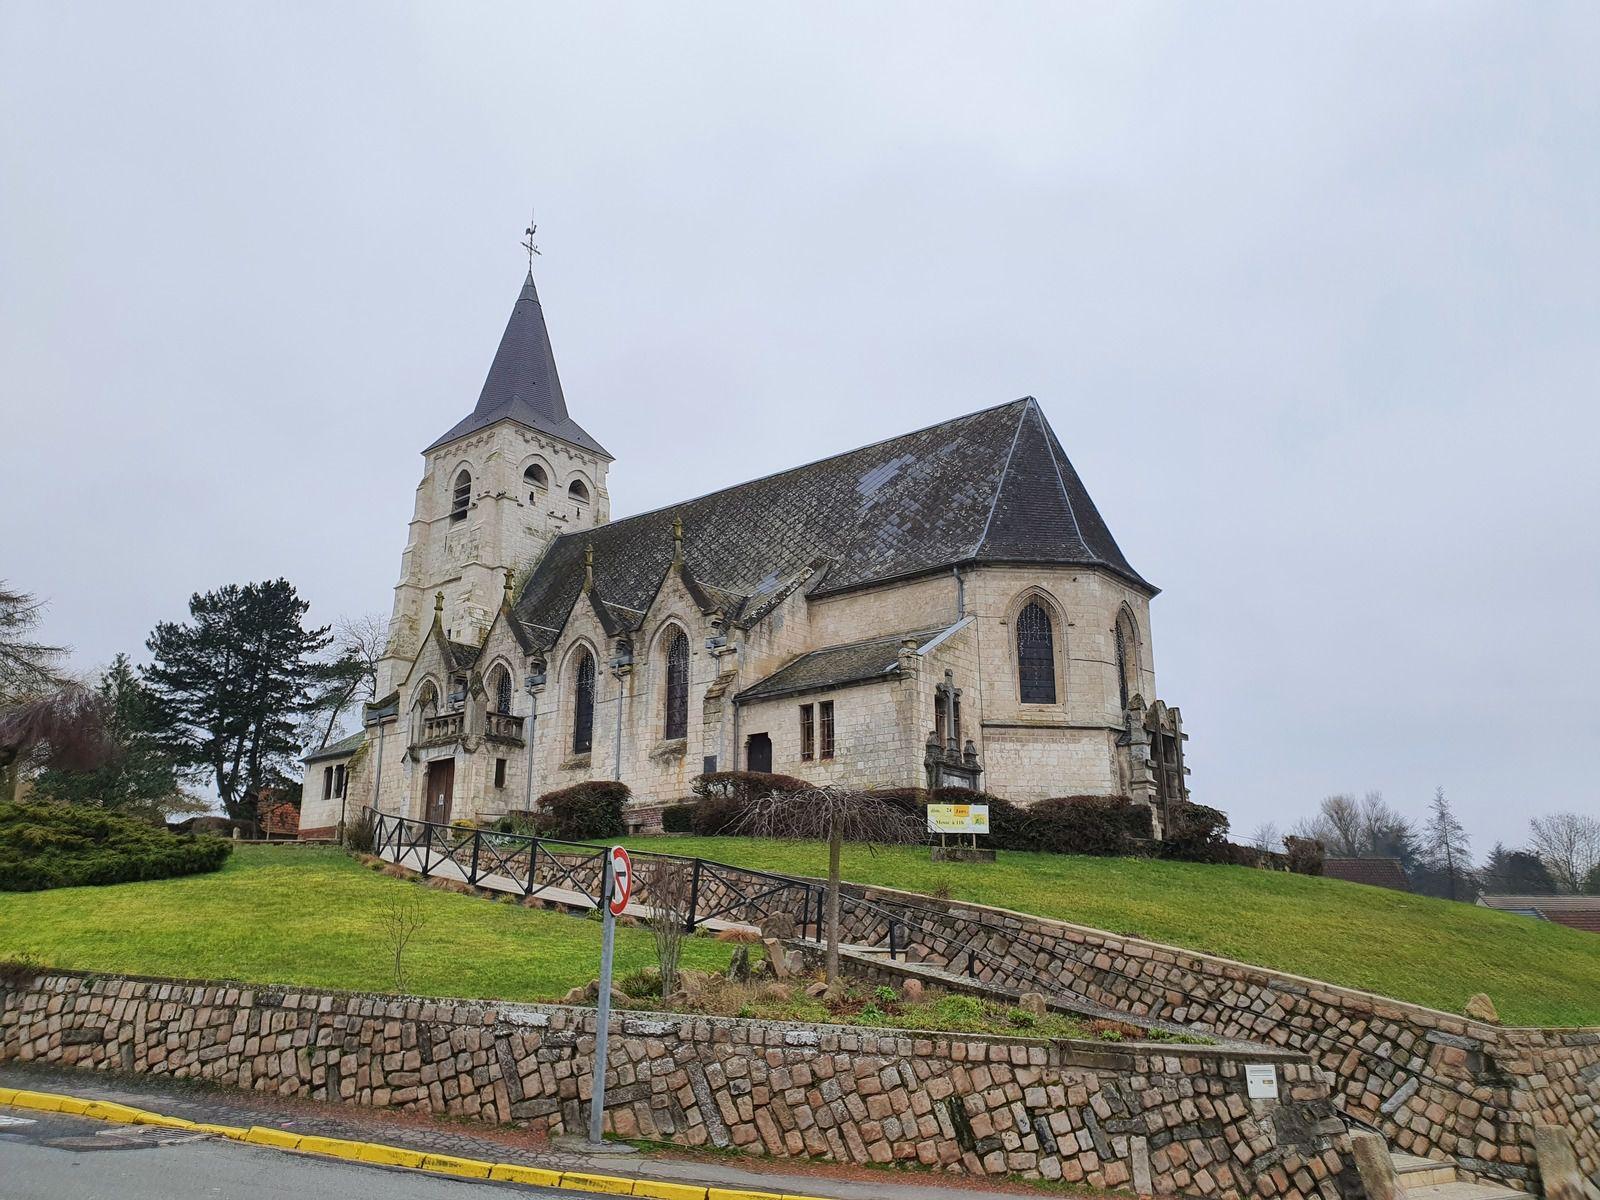 Église Saint-Martin de Bouvigny-Boyeffles